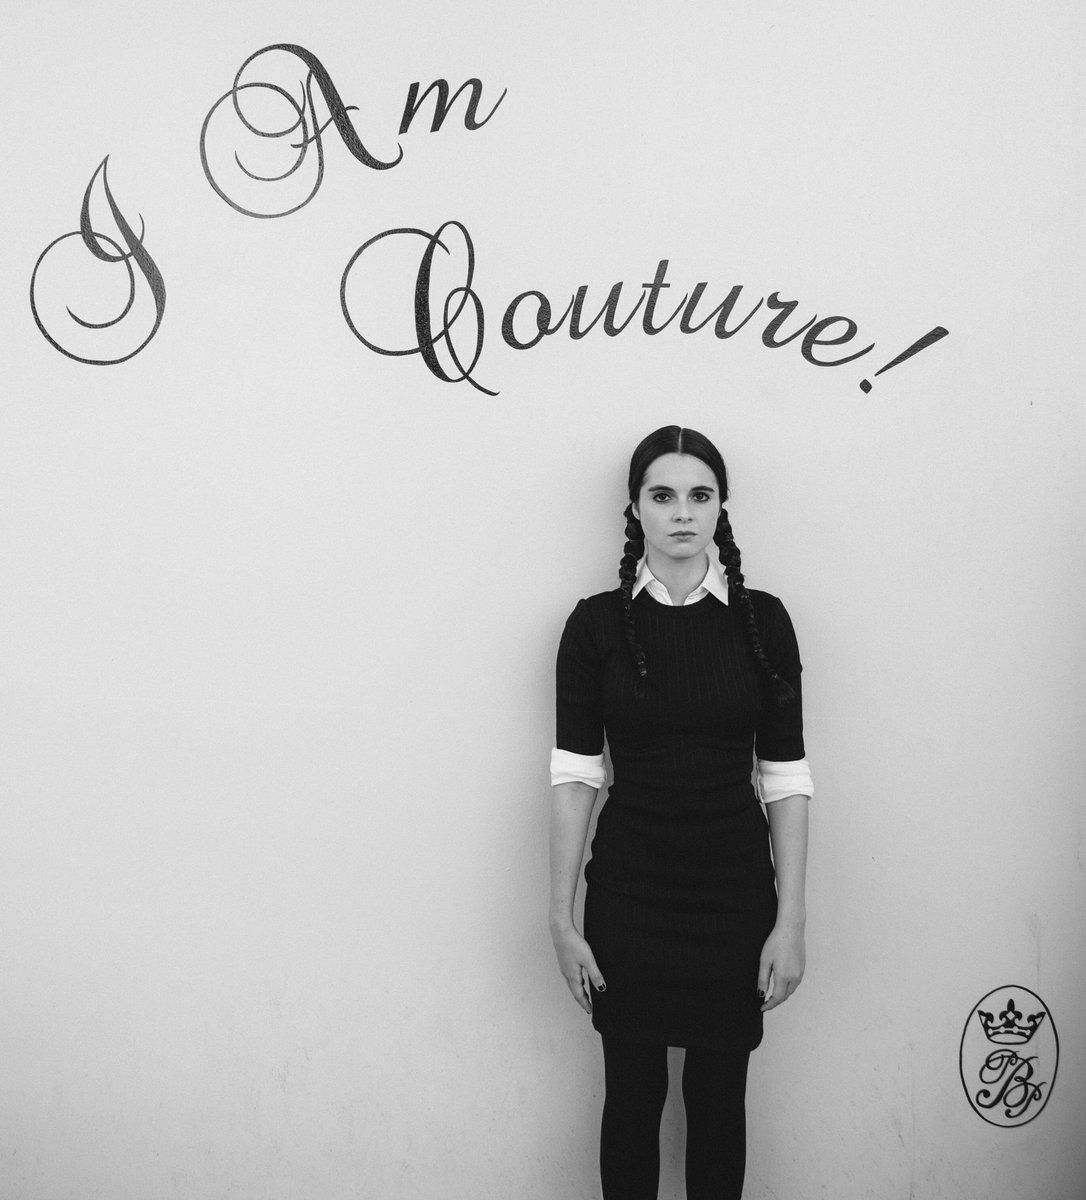 w e d n e s d a y  o n  a  w e d n e s d a y . .  #fashion #couture #overwhelmingexcitment @…  http:// instagram.com/p/BaZtqBWjQFm/  &nbsp;  <br>http://pic.twitter.com/FbzjiBxSFY